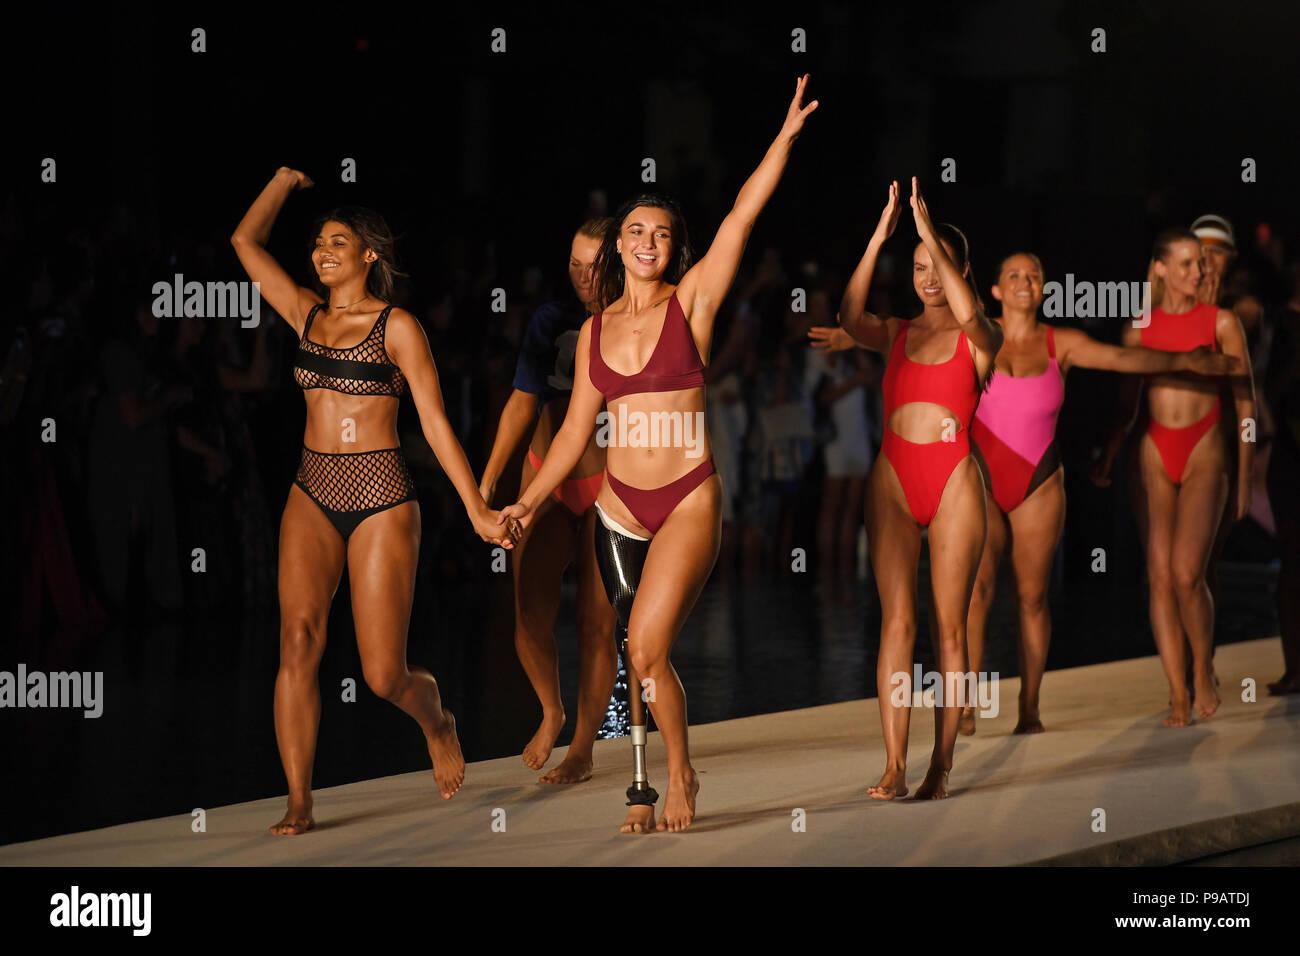 Miami Beach, FL, USA. Am 15. Juli 2018. Danielle Herrington und ...